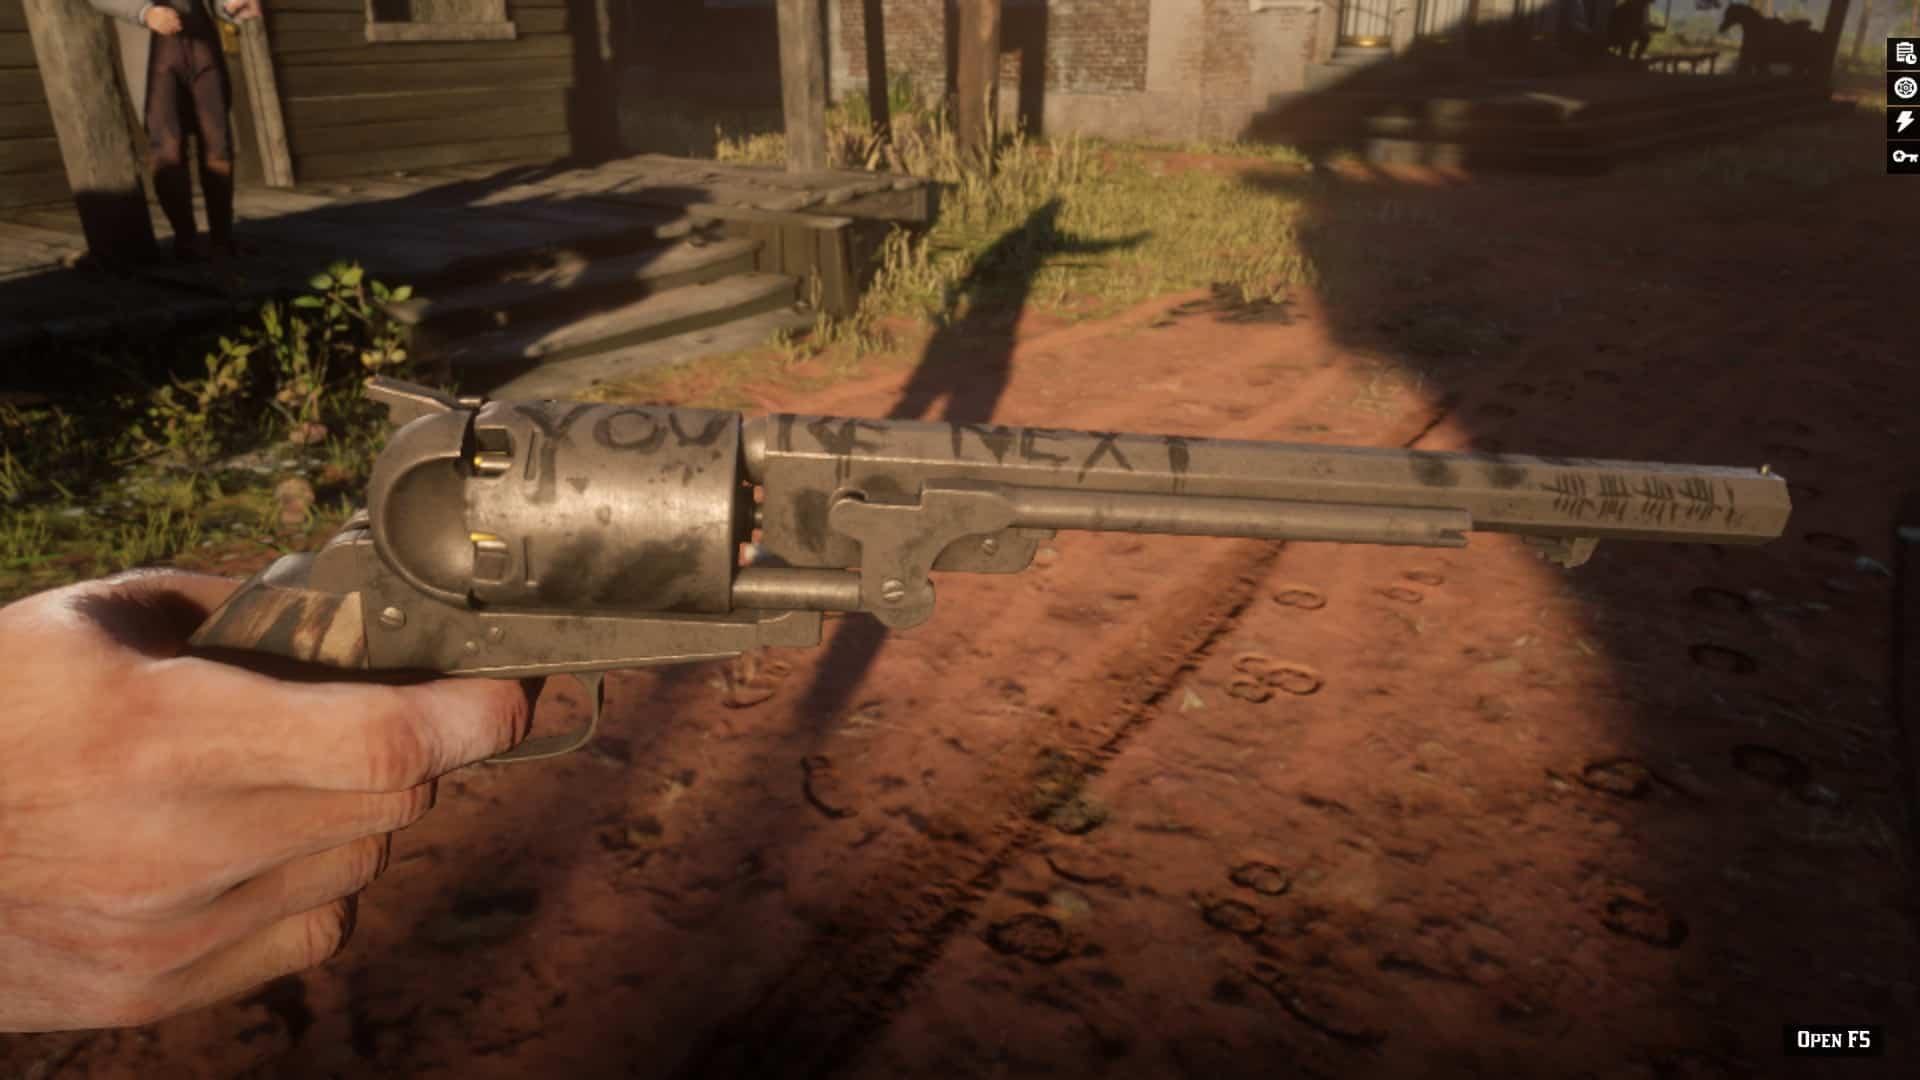 RDR2 - Lowrys Revolver in Story Mod